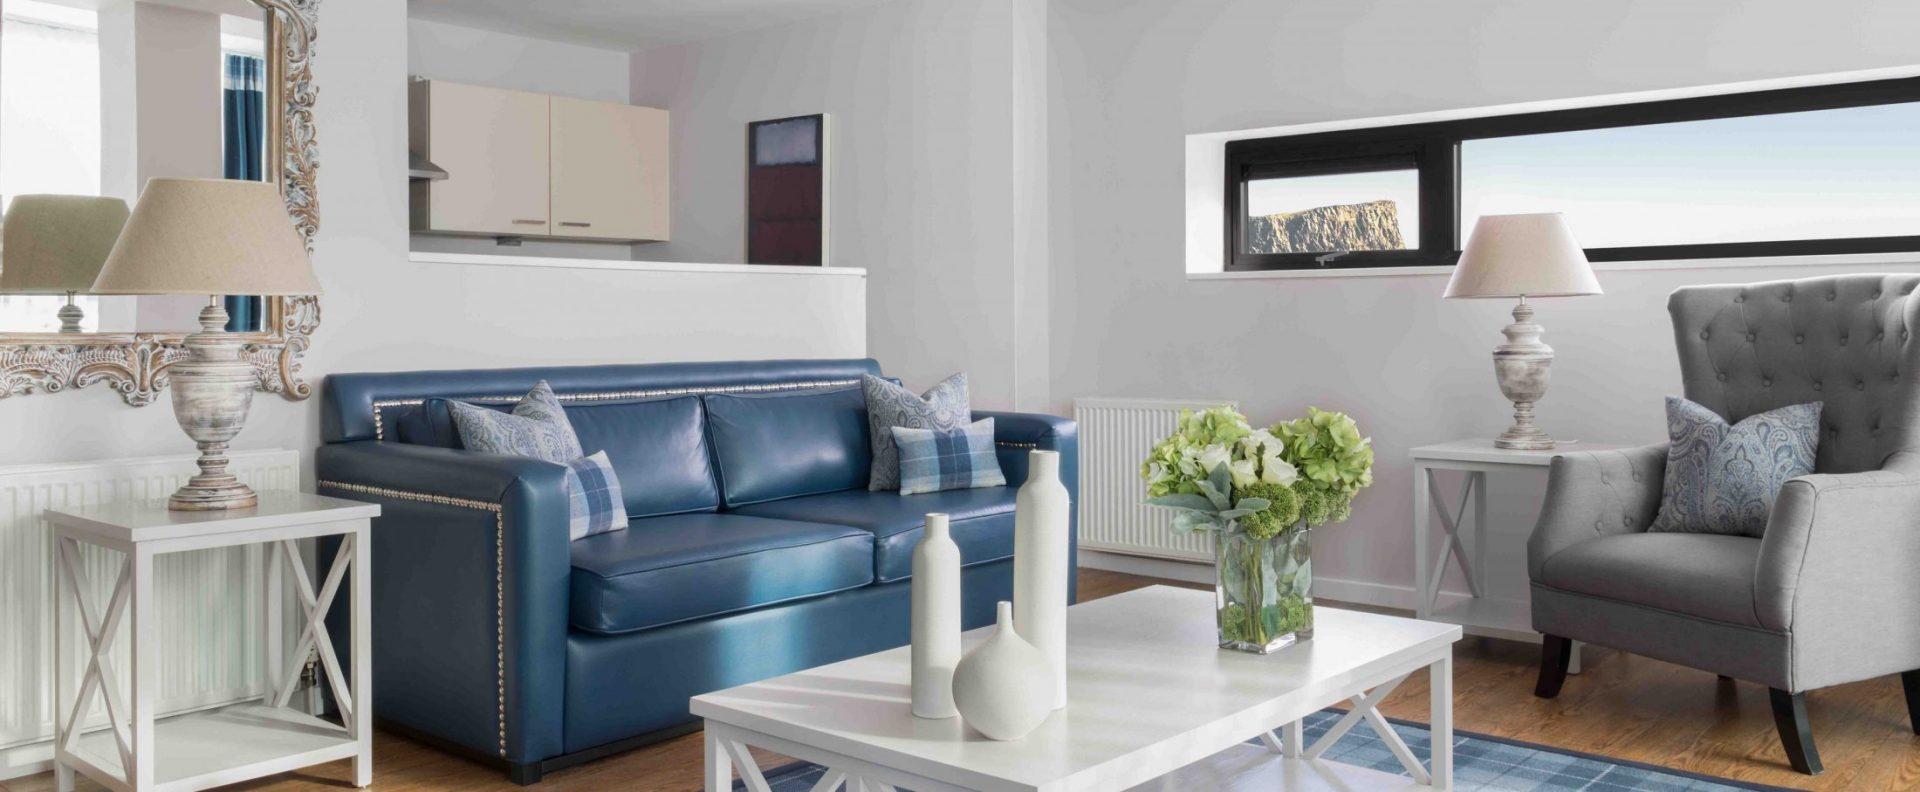 Princess Street Suites | Serviced Apartments in Edinburgh